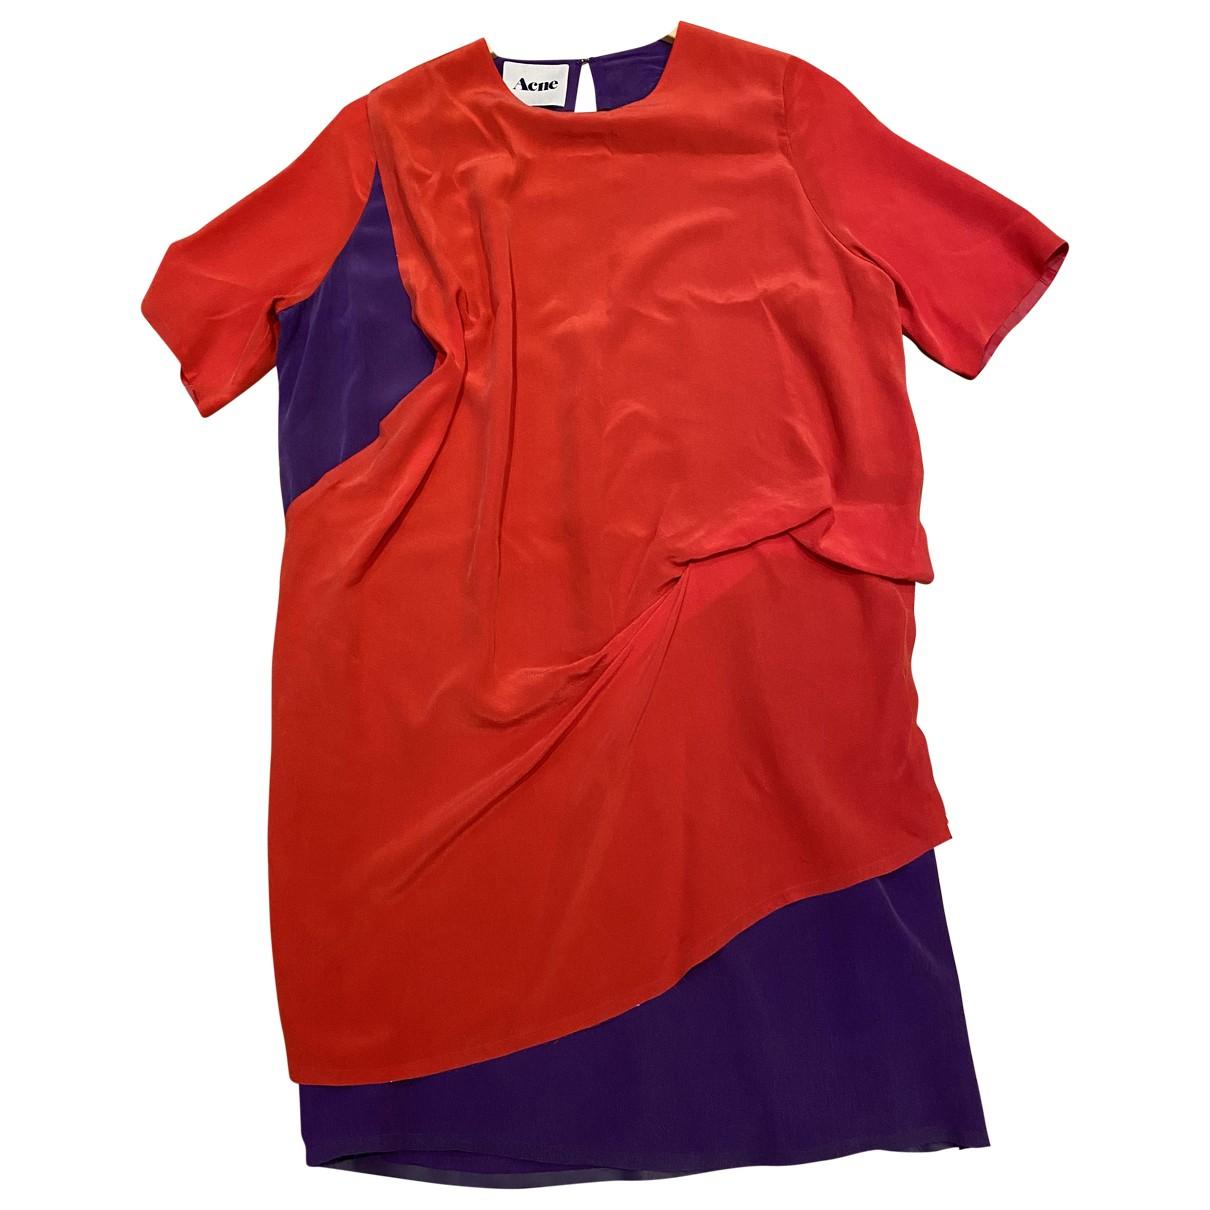 Acne Studios \N Red Silk dress for Women 38 FR